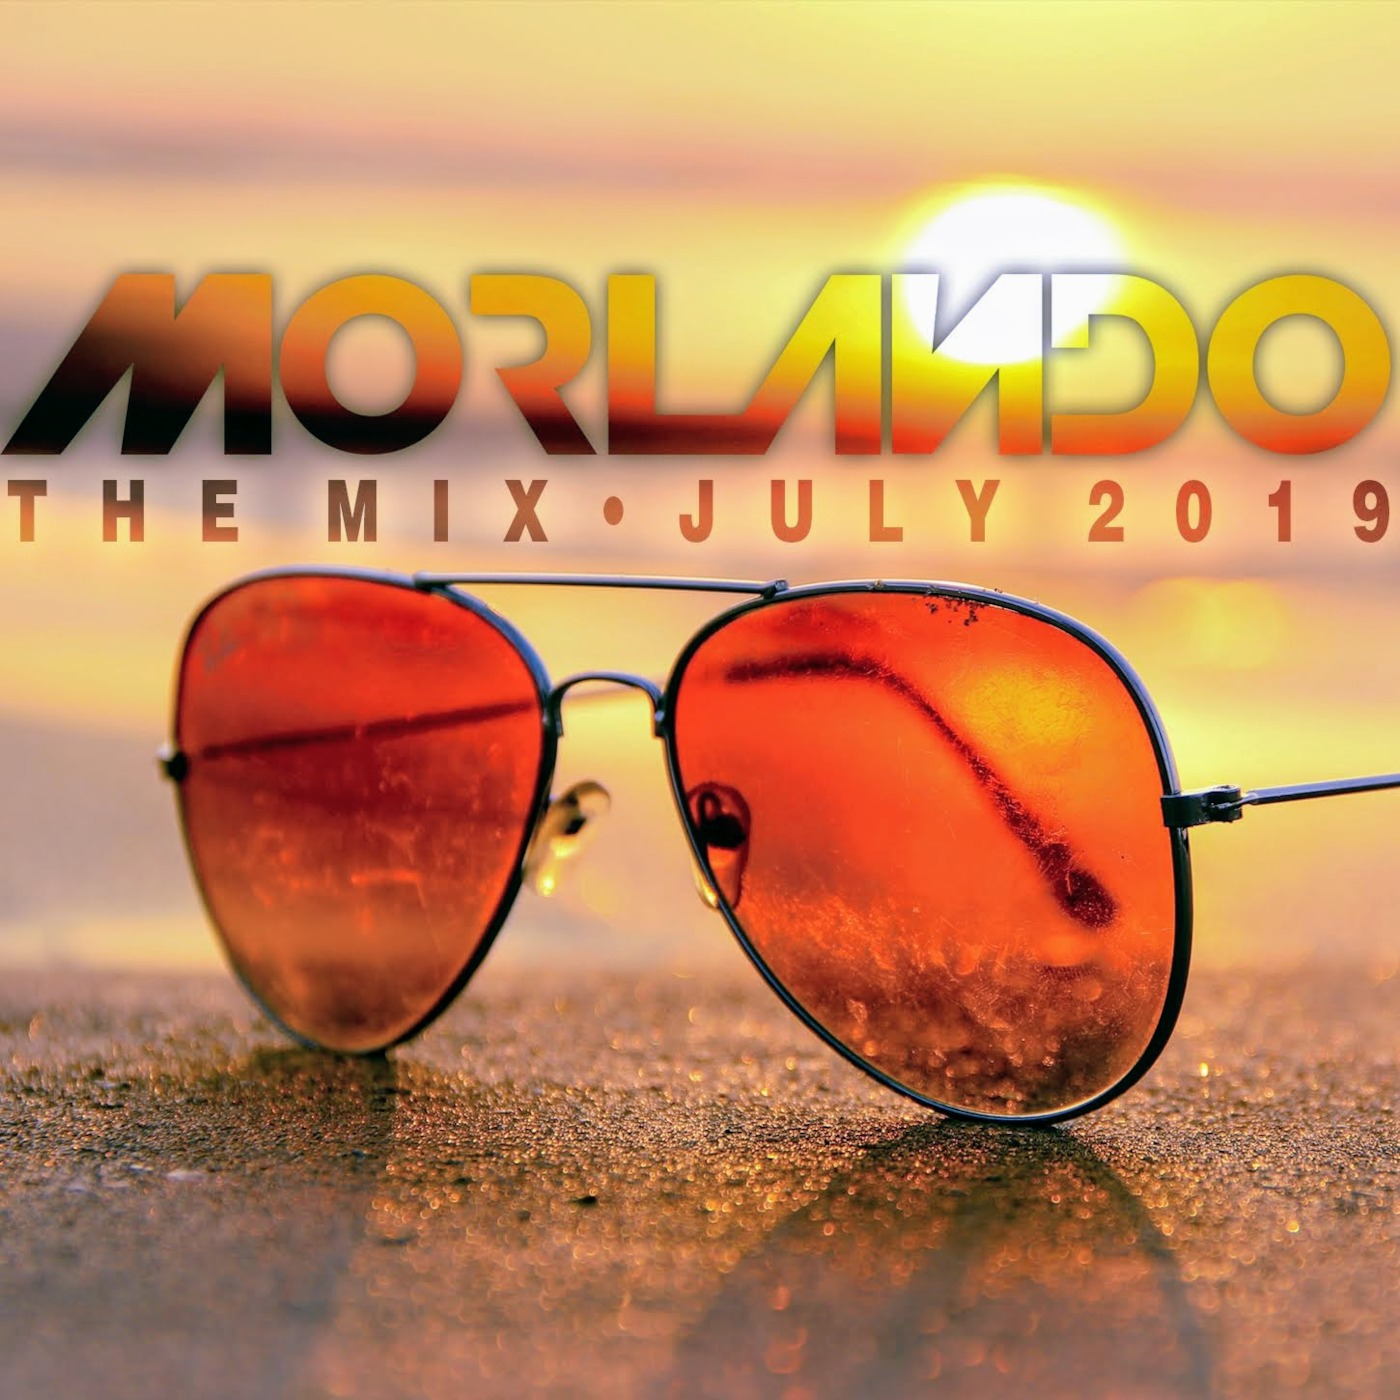 Morlando - The Mix - July 2019 Morlando - The Mix podcast